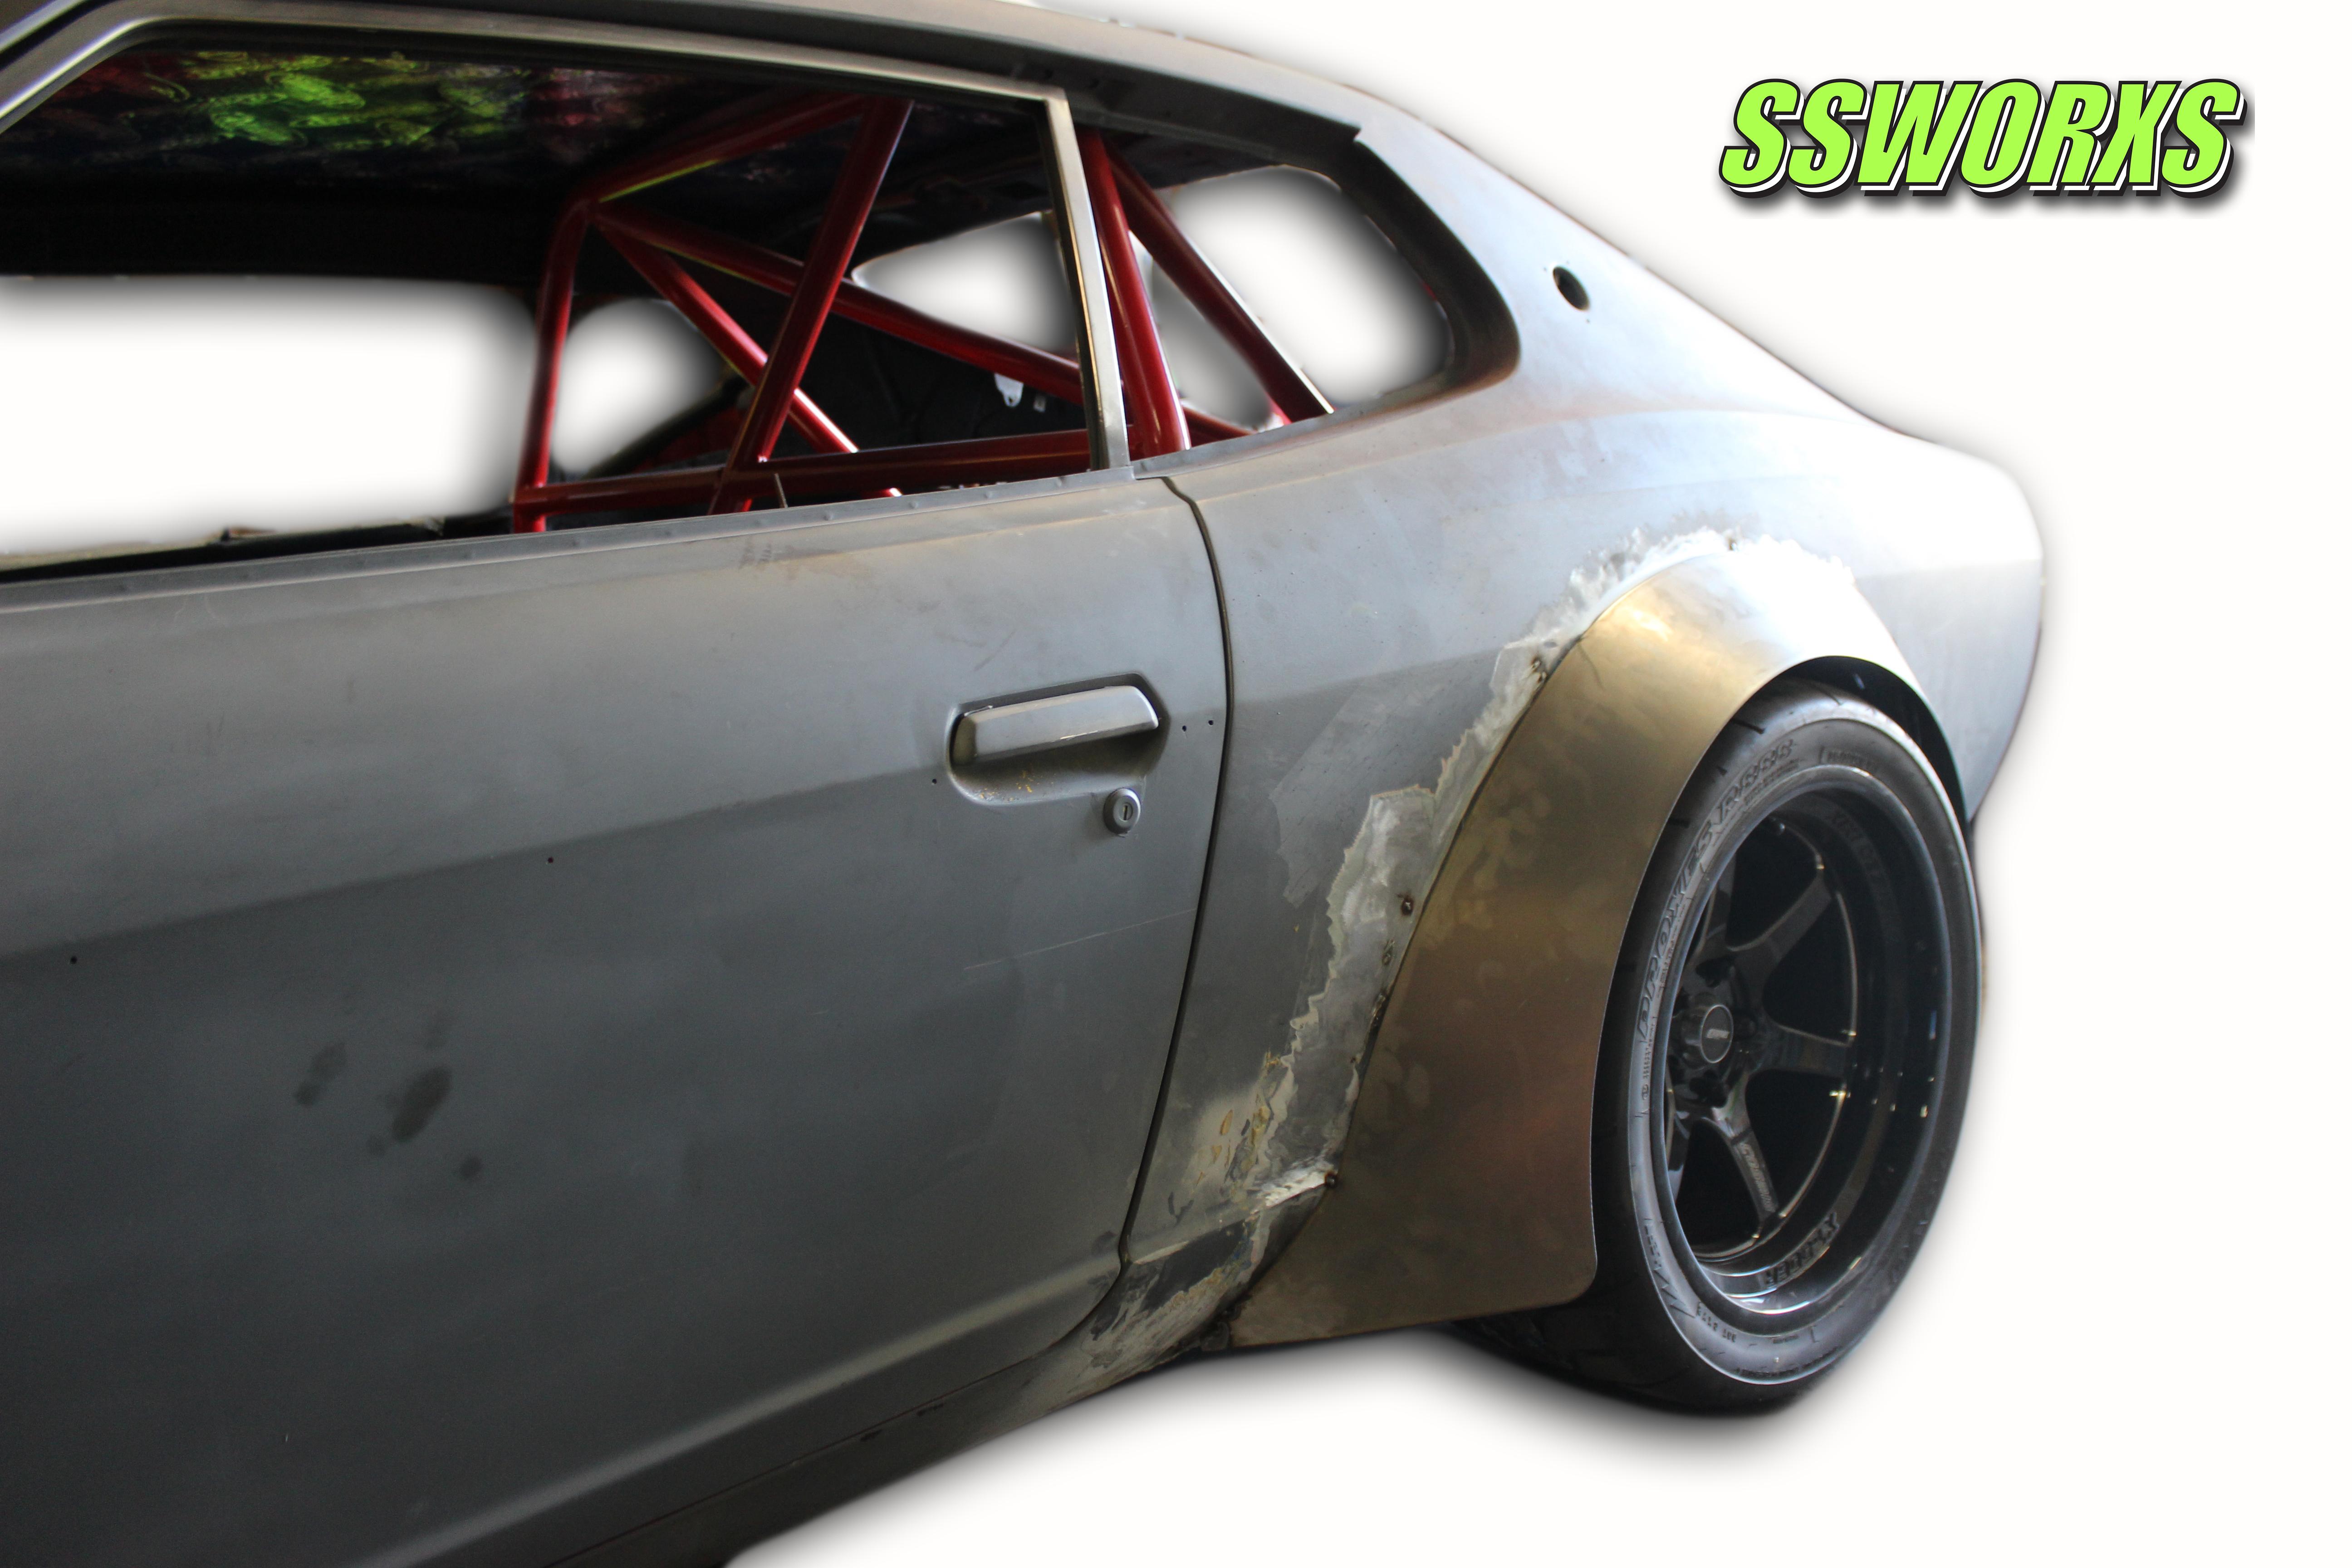 Ssworxs Genuine Japanesse Car Parts And Accessories